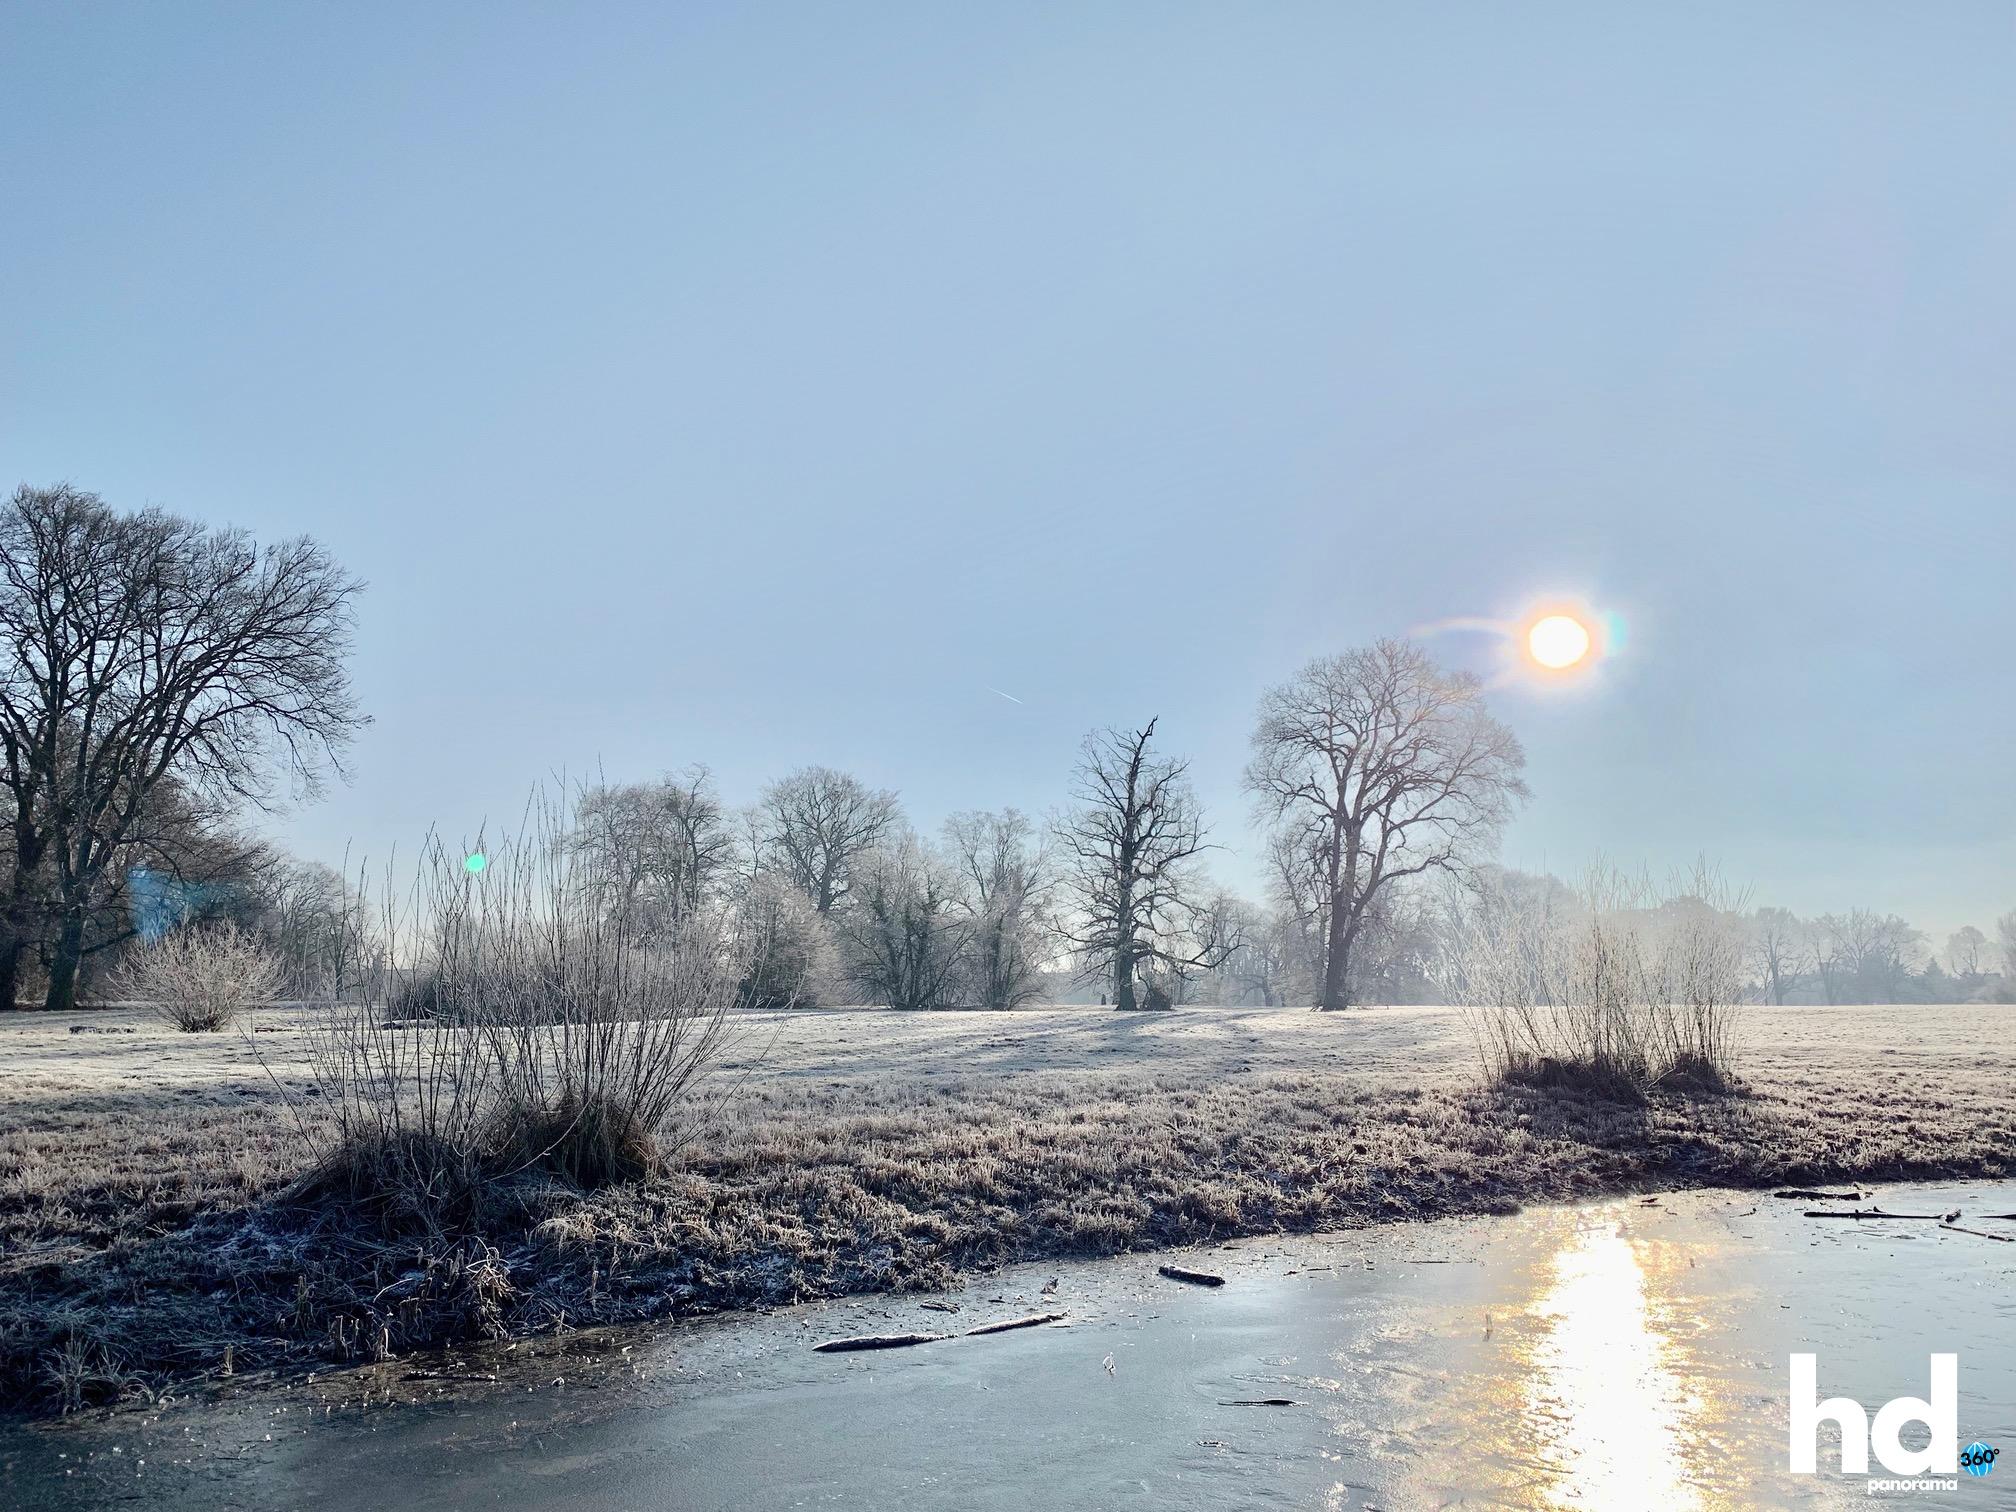 Park Babelsberg: Alles sehr frostig - Der eingefrorene Kindermannsee - HD-Panorama © René Blanke